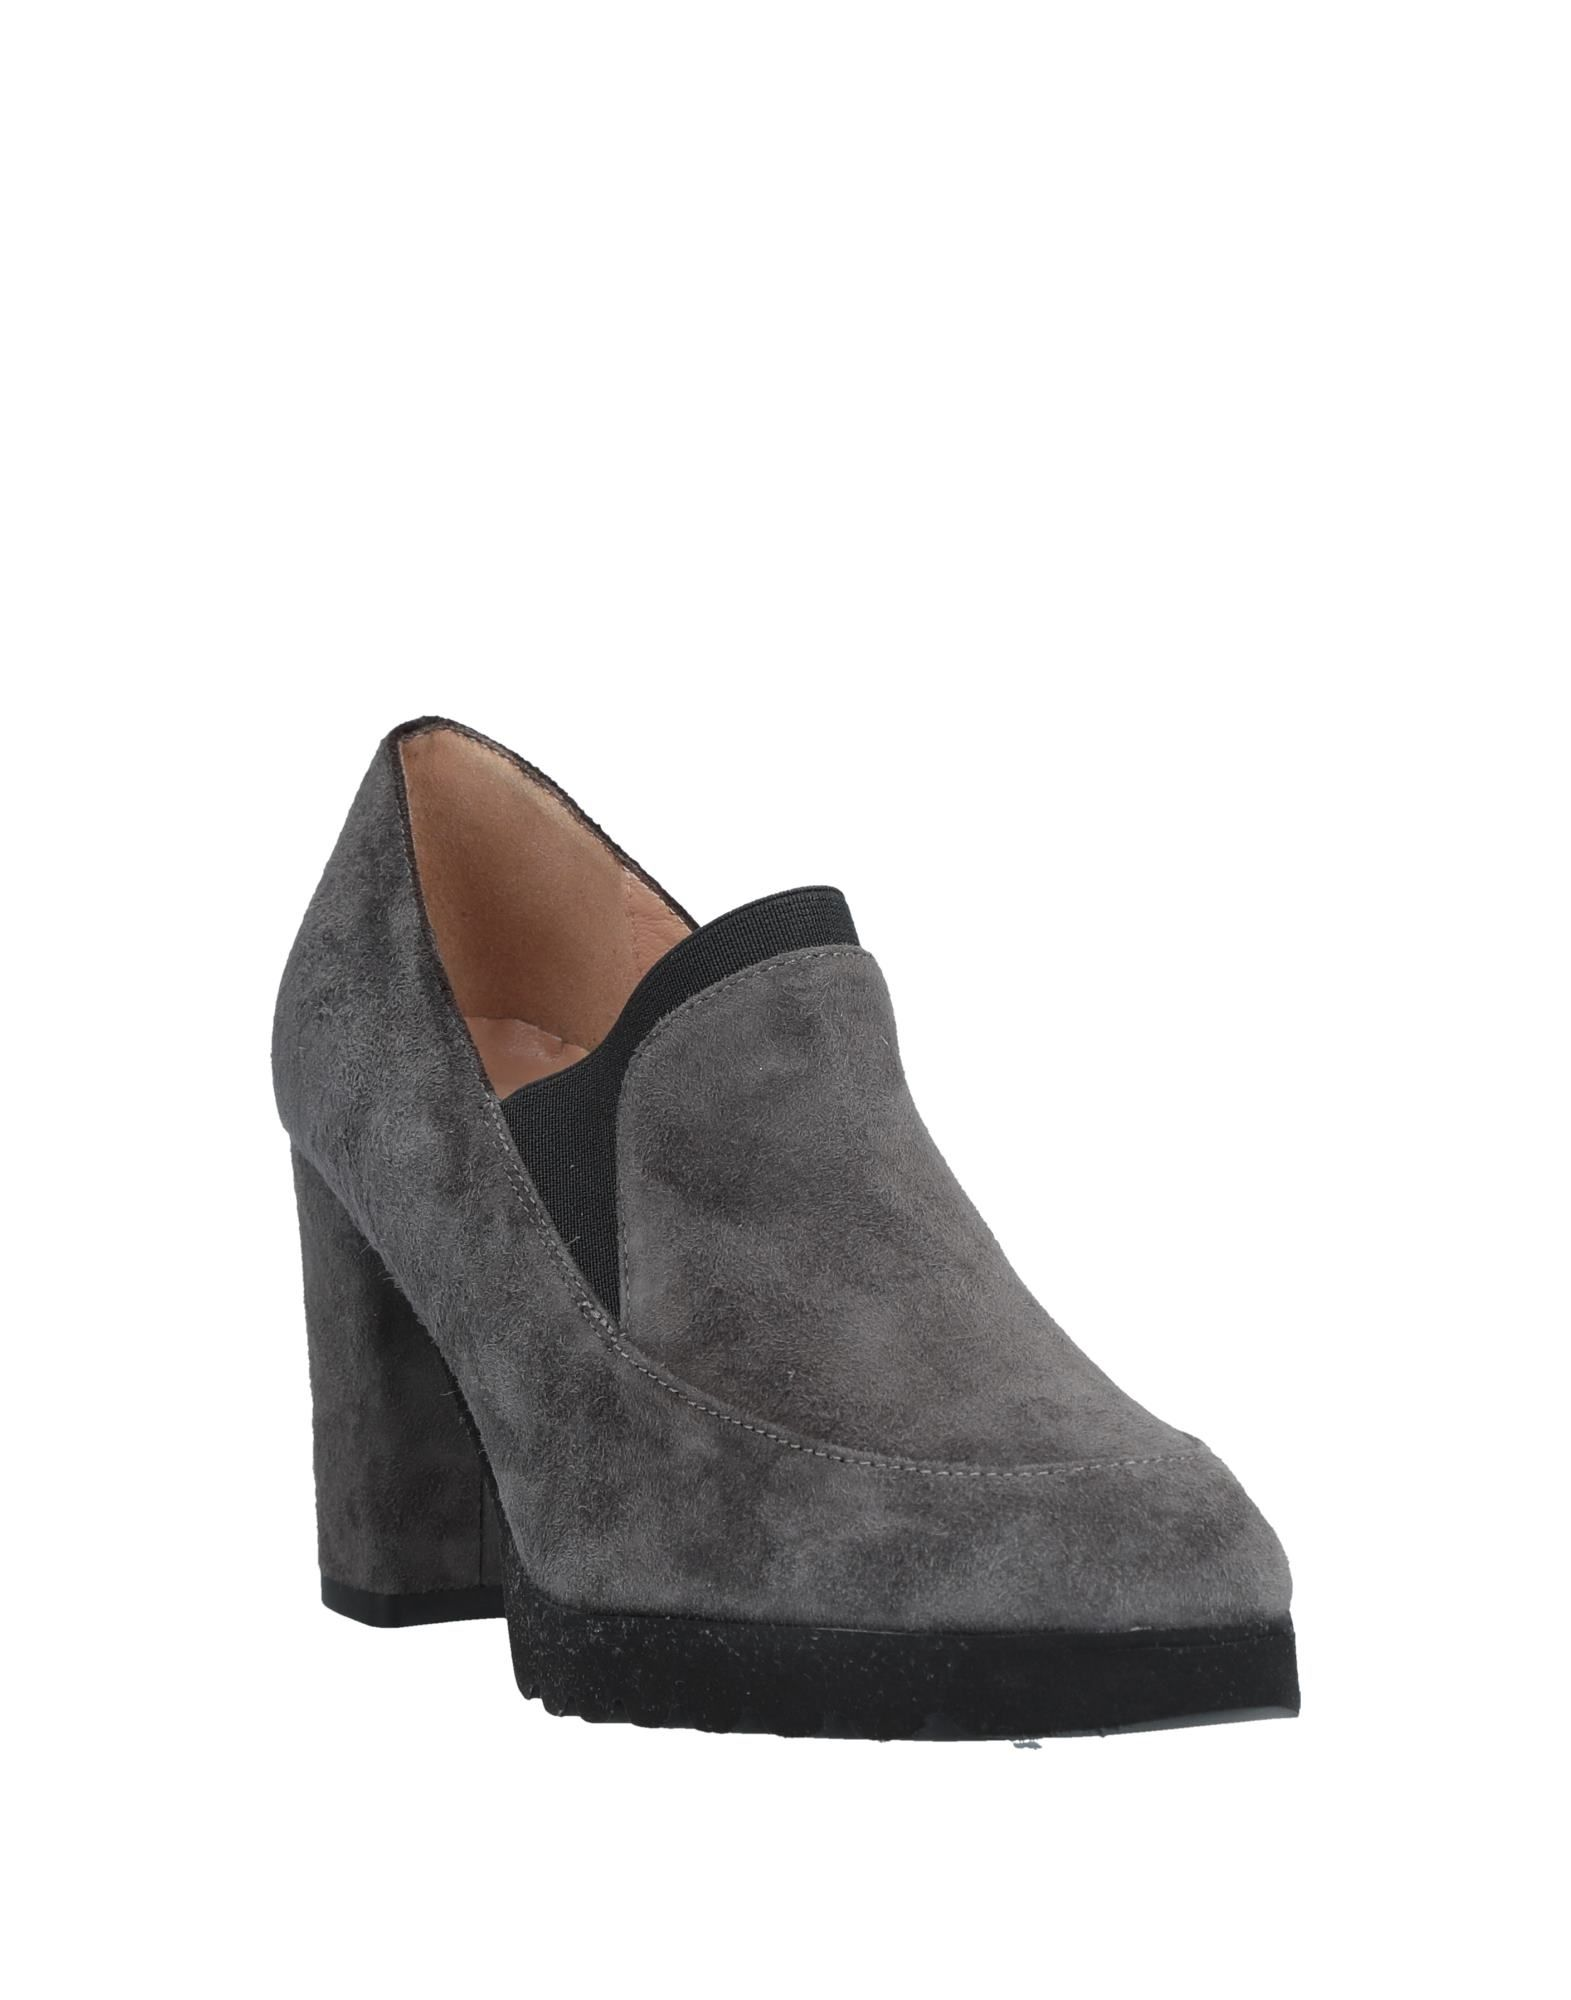 Stilvolle billige Pumps Schuhe Il Borgo Firenze Pumps billige Damen  11497648UR a27760